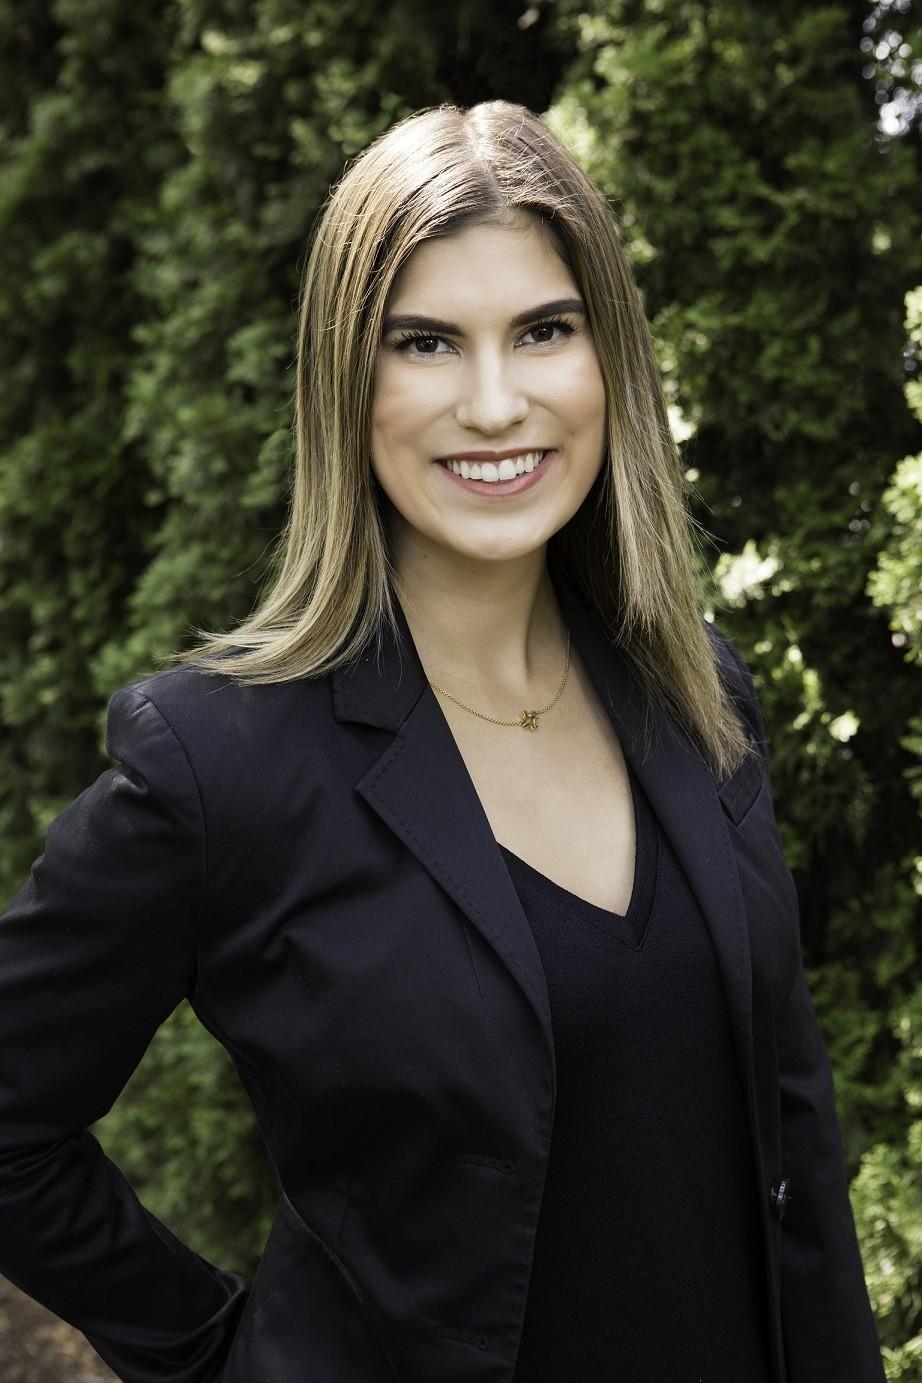 Madeline O'Billovich